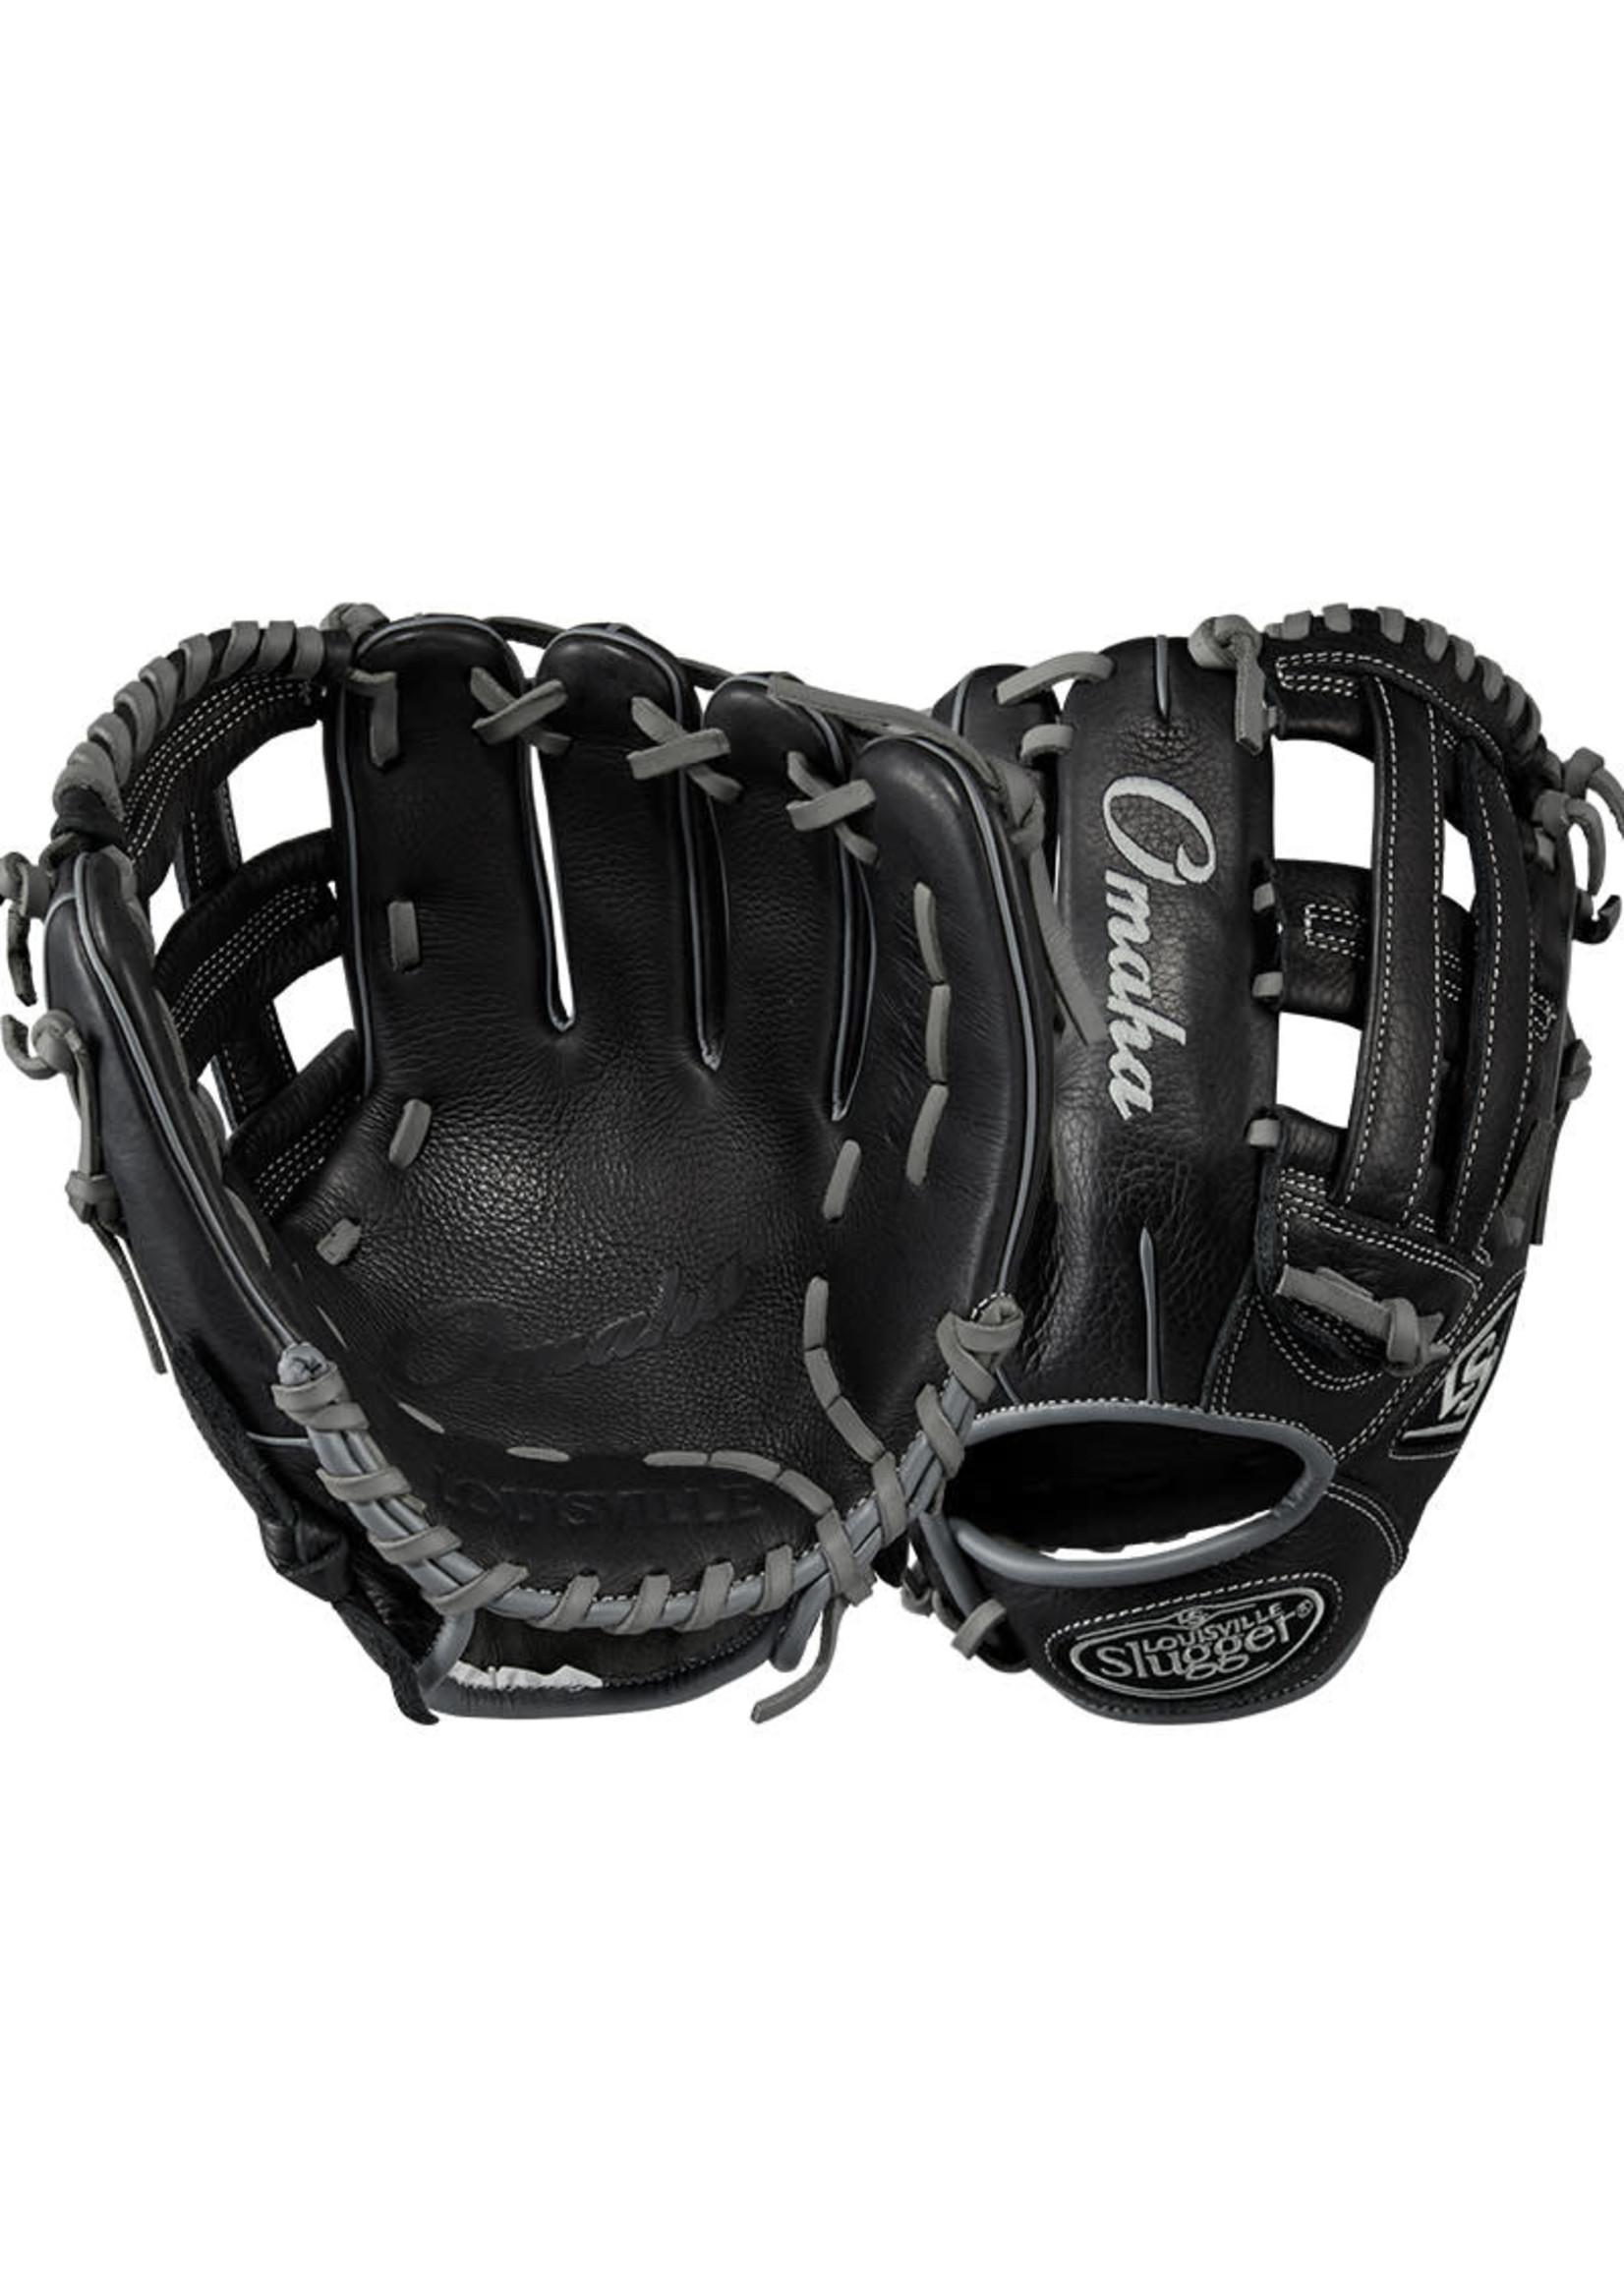 Louisville (Canada) LOUISVILLE Omaha Fielding Glove 11.50'', Dual Post Web 11.50''  REG Adult  Black